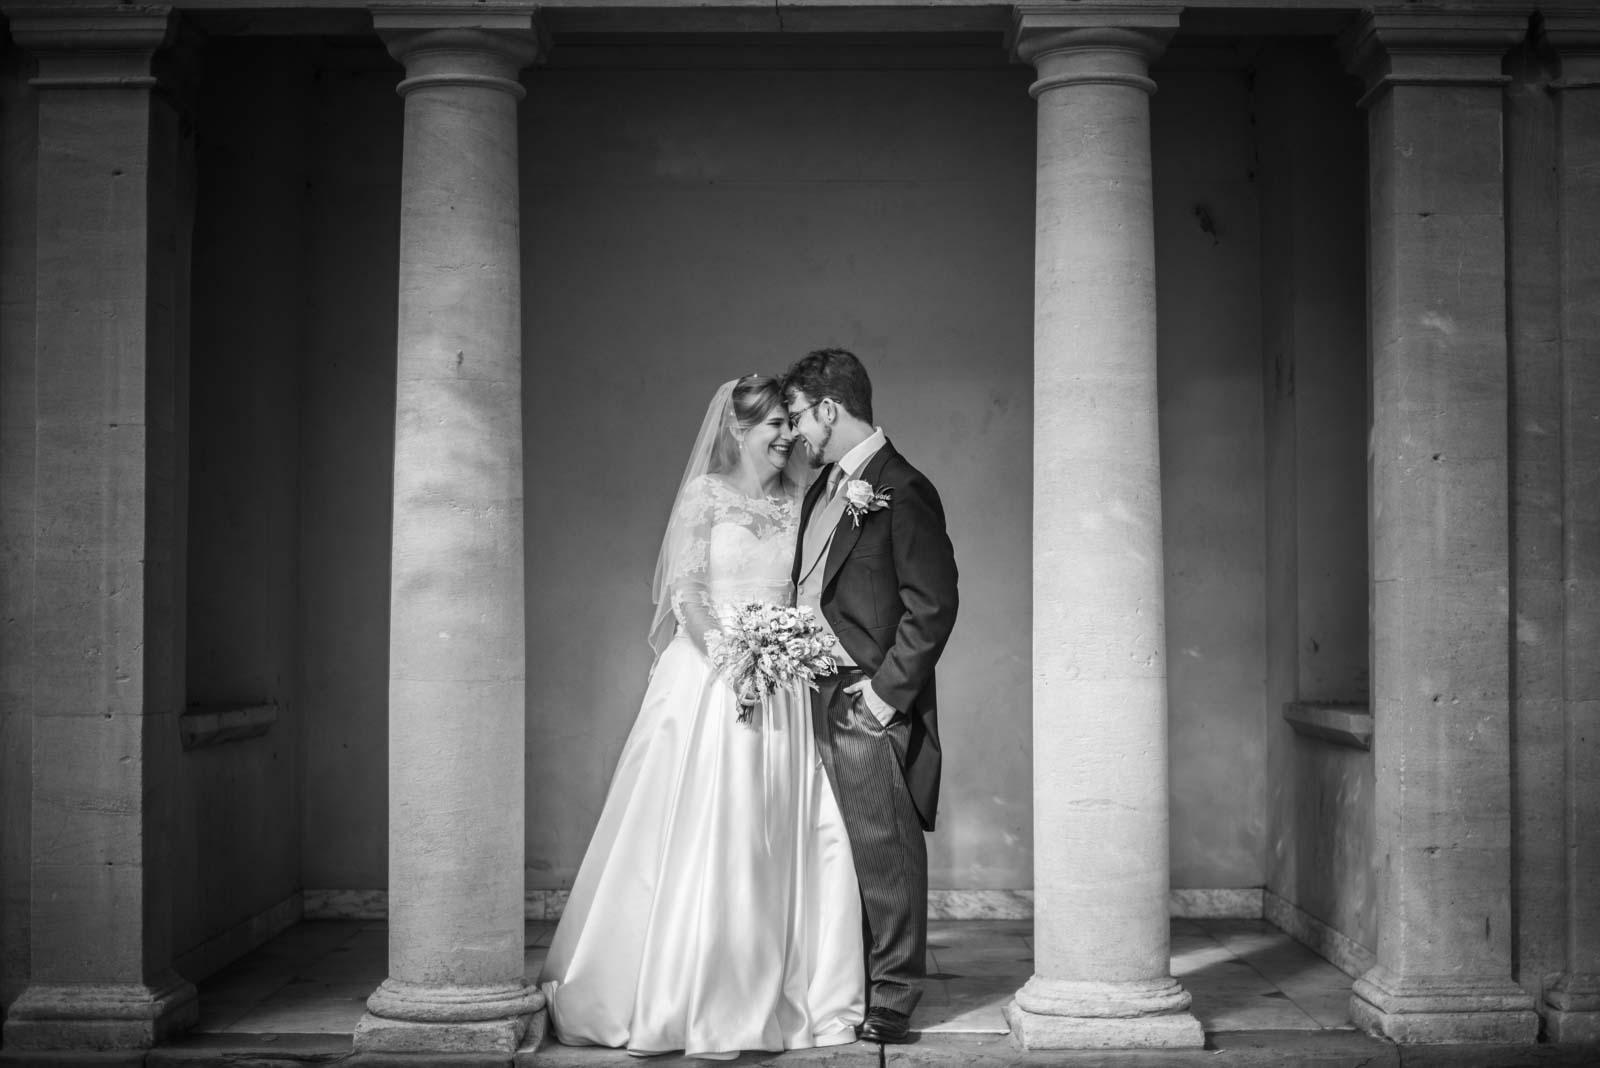 Oxfordshire Wedding Photographer, Elizabeth and Joel Wedding Photography (290 of 365)